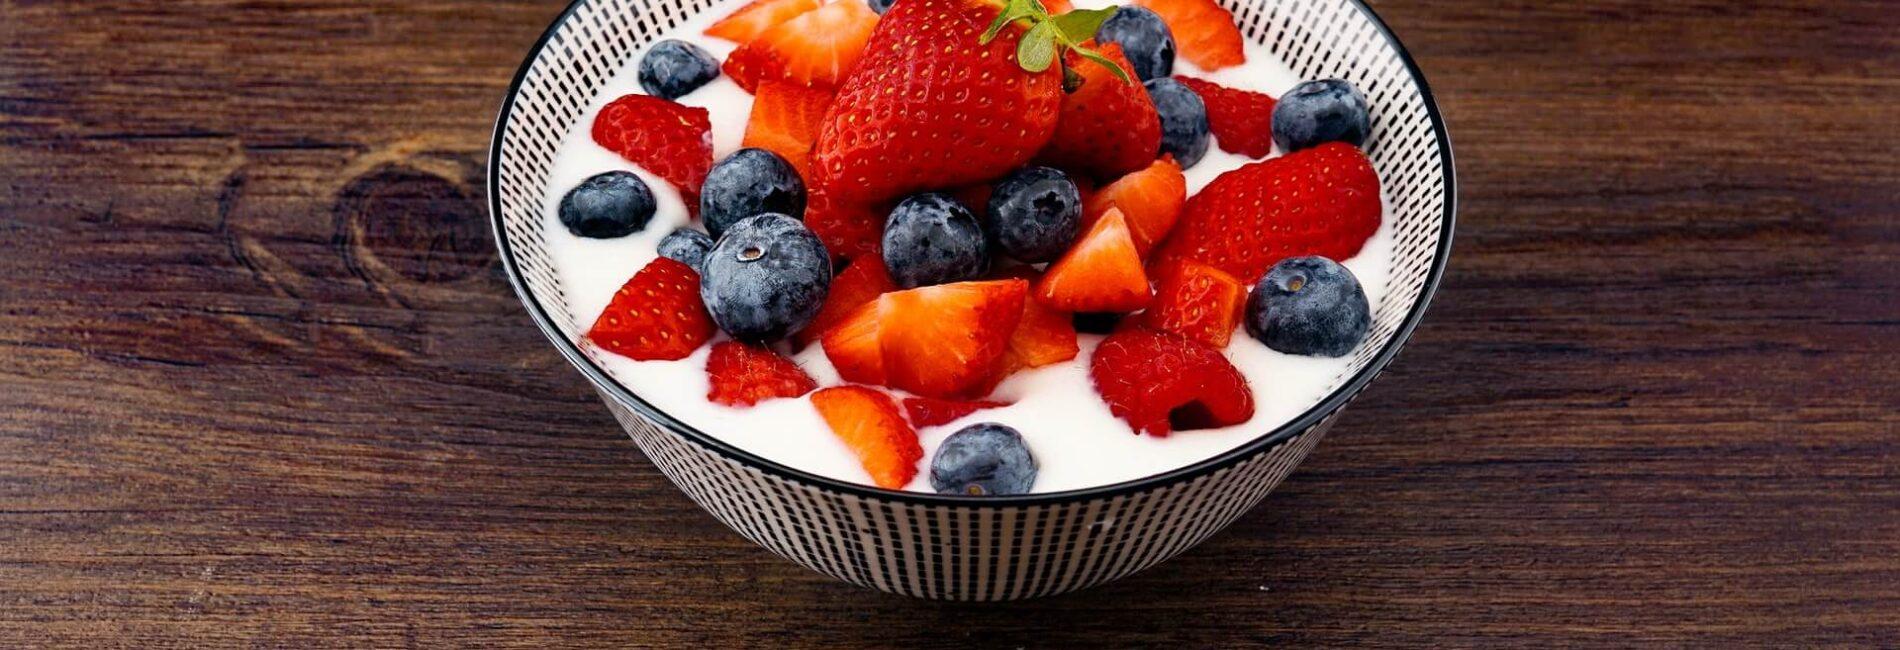 July 4th Bowl Dessert